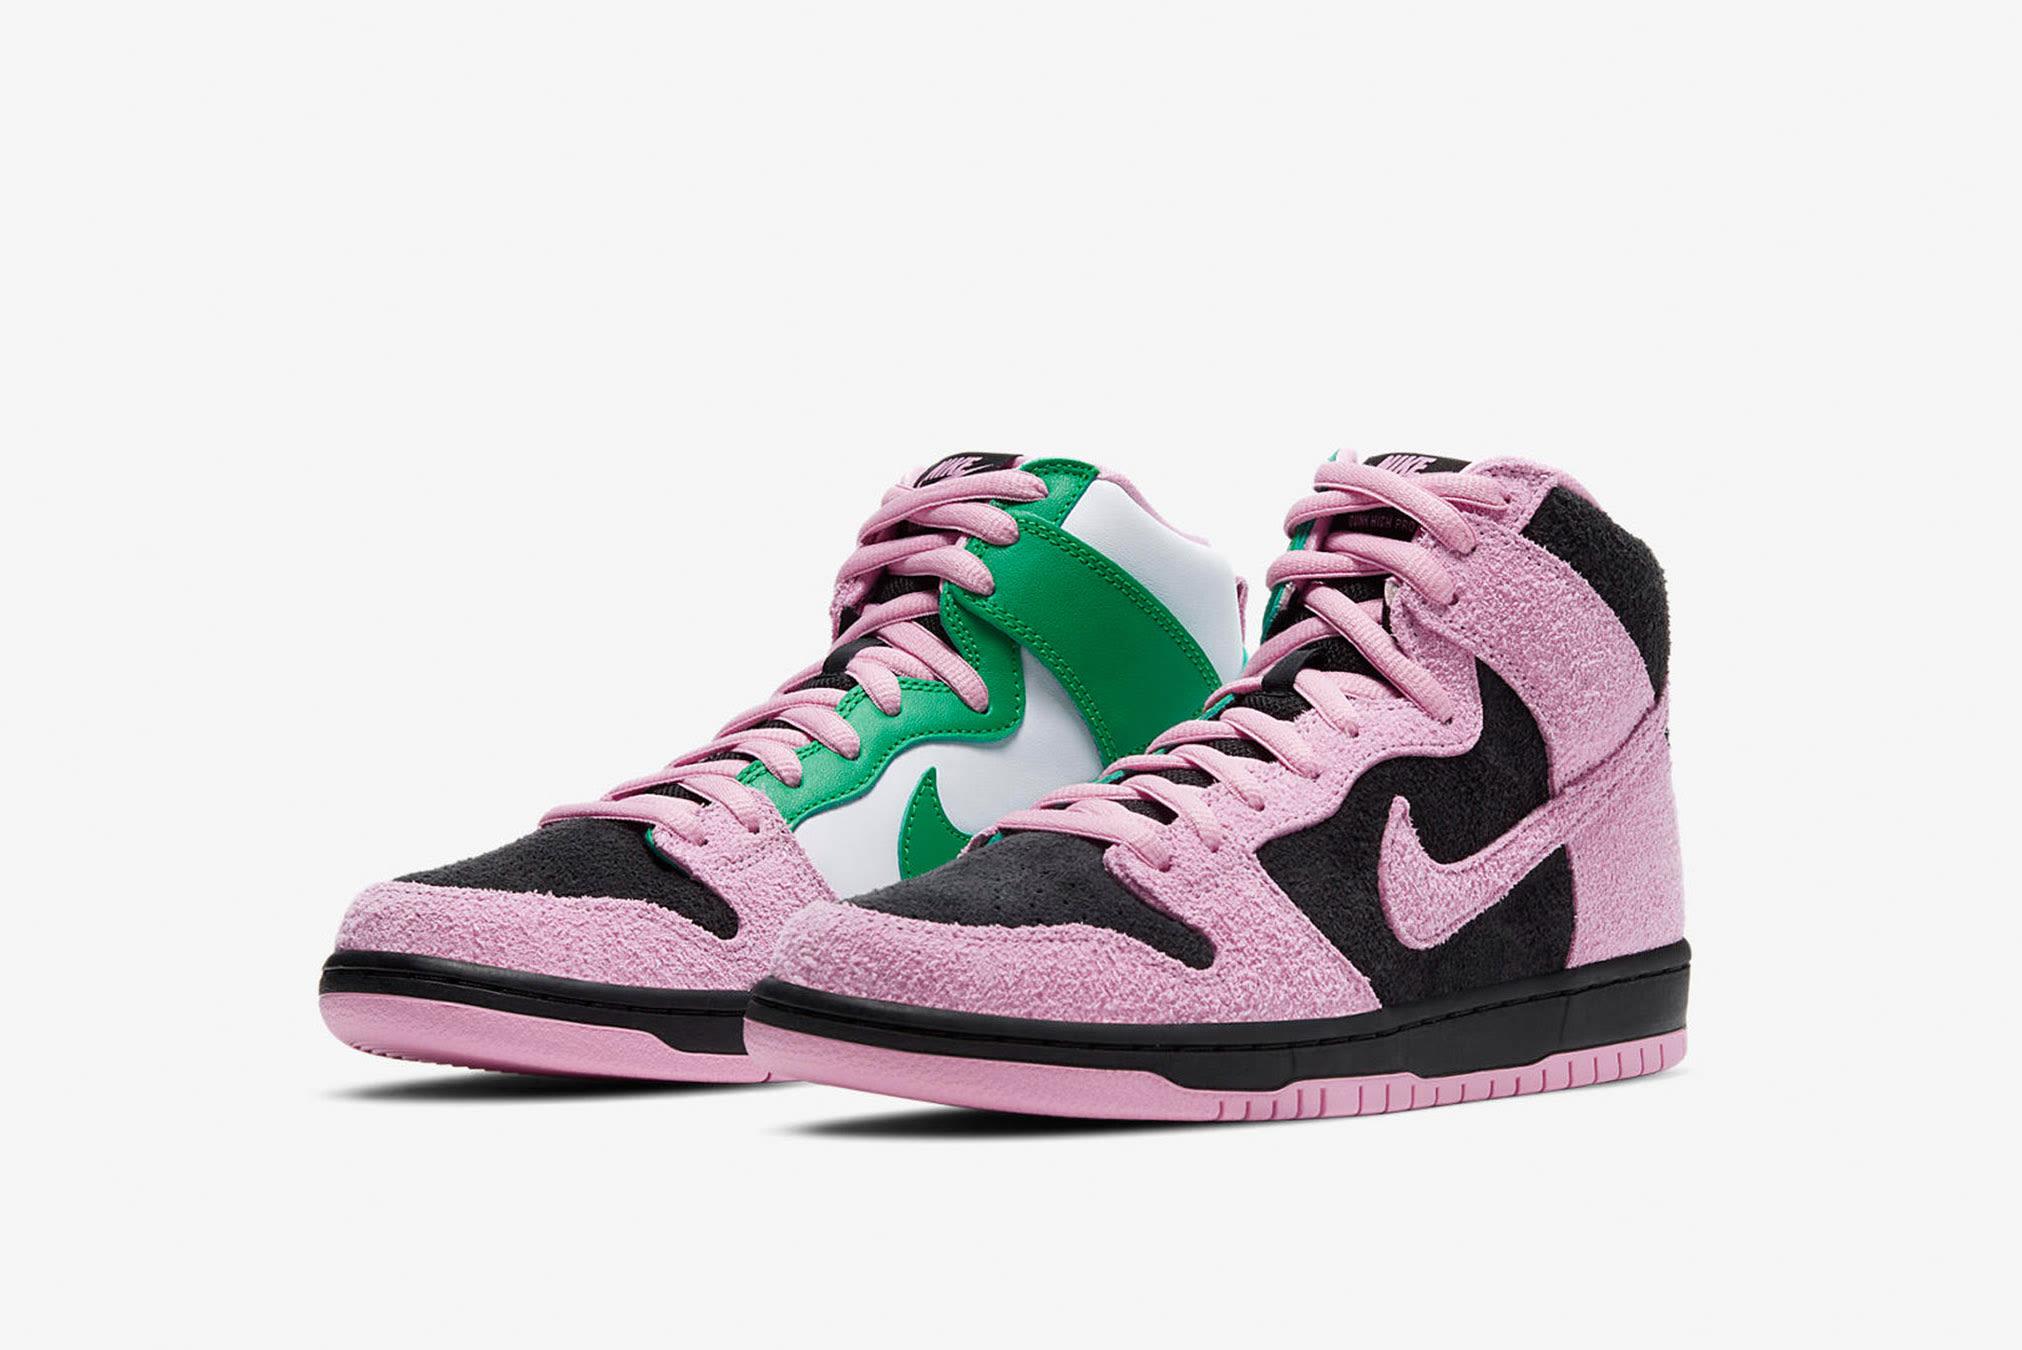 "Nike SB Dunk High Pro PRM ""Invert"" - CU7349-001"